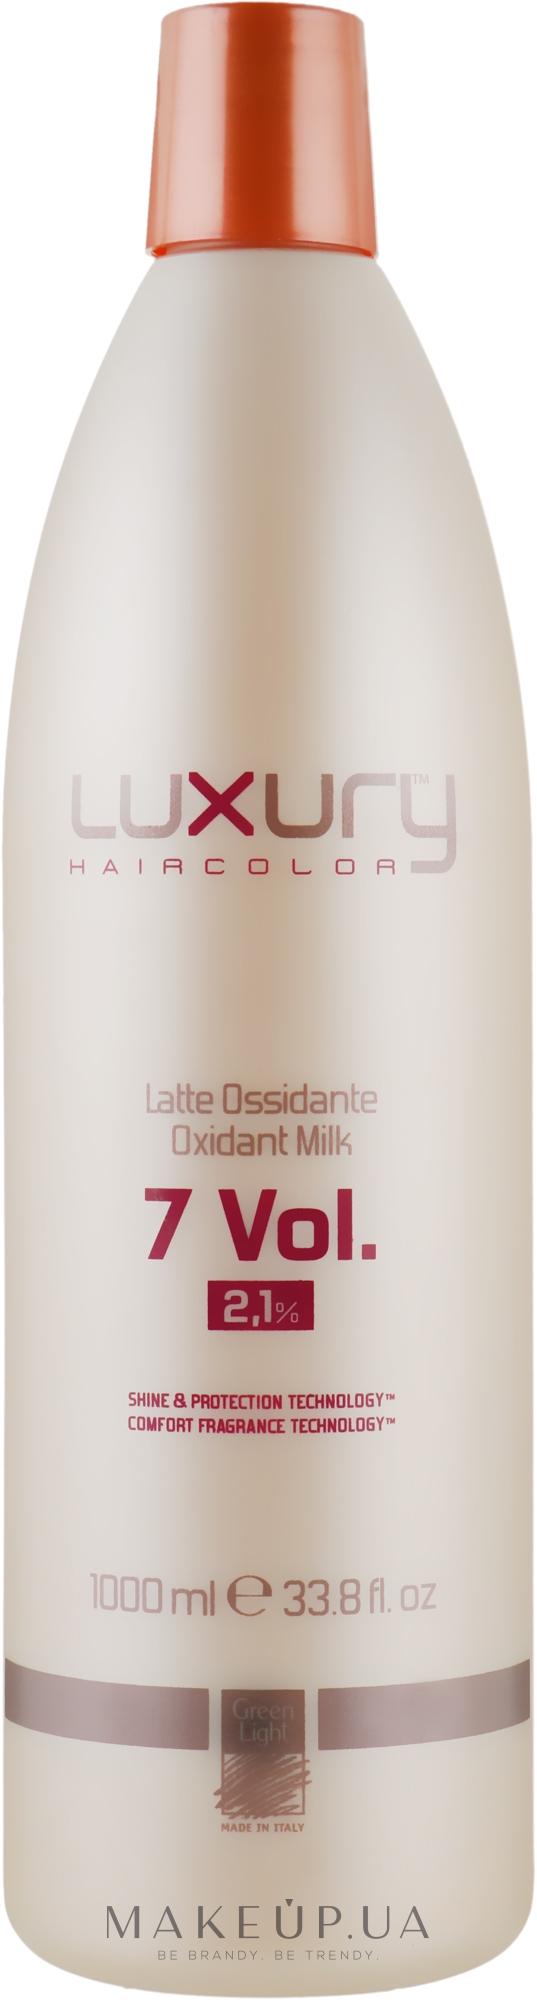 Молочний Оксидант - Green Light Luxury Haircolor Oxidant Milk 2.1% 7 vol. — фото 1000ml